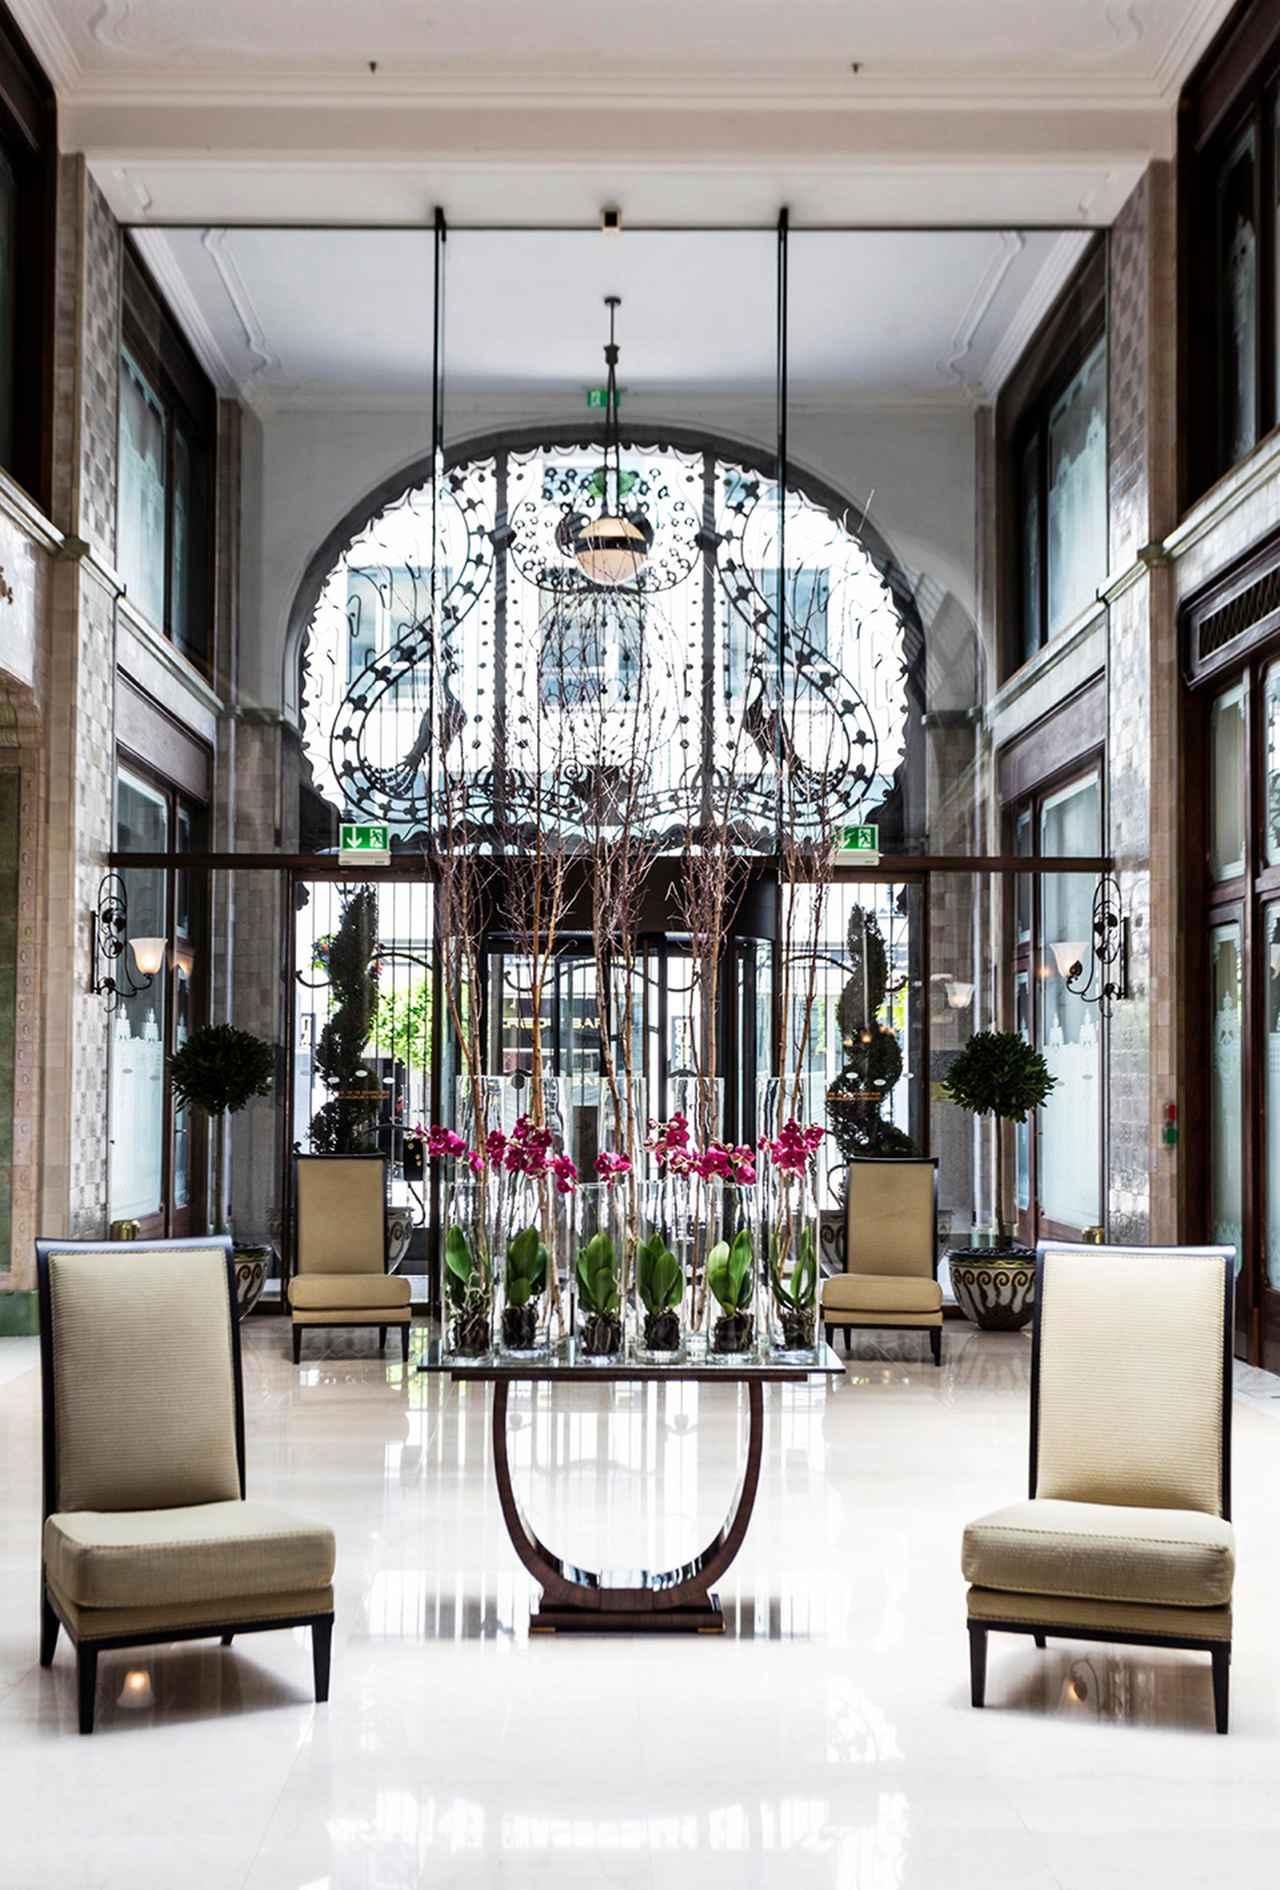 Images : フォーシーズンズ・ホテル・グレシャム・パレス・ブダペスト